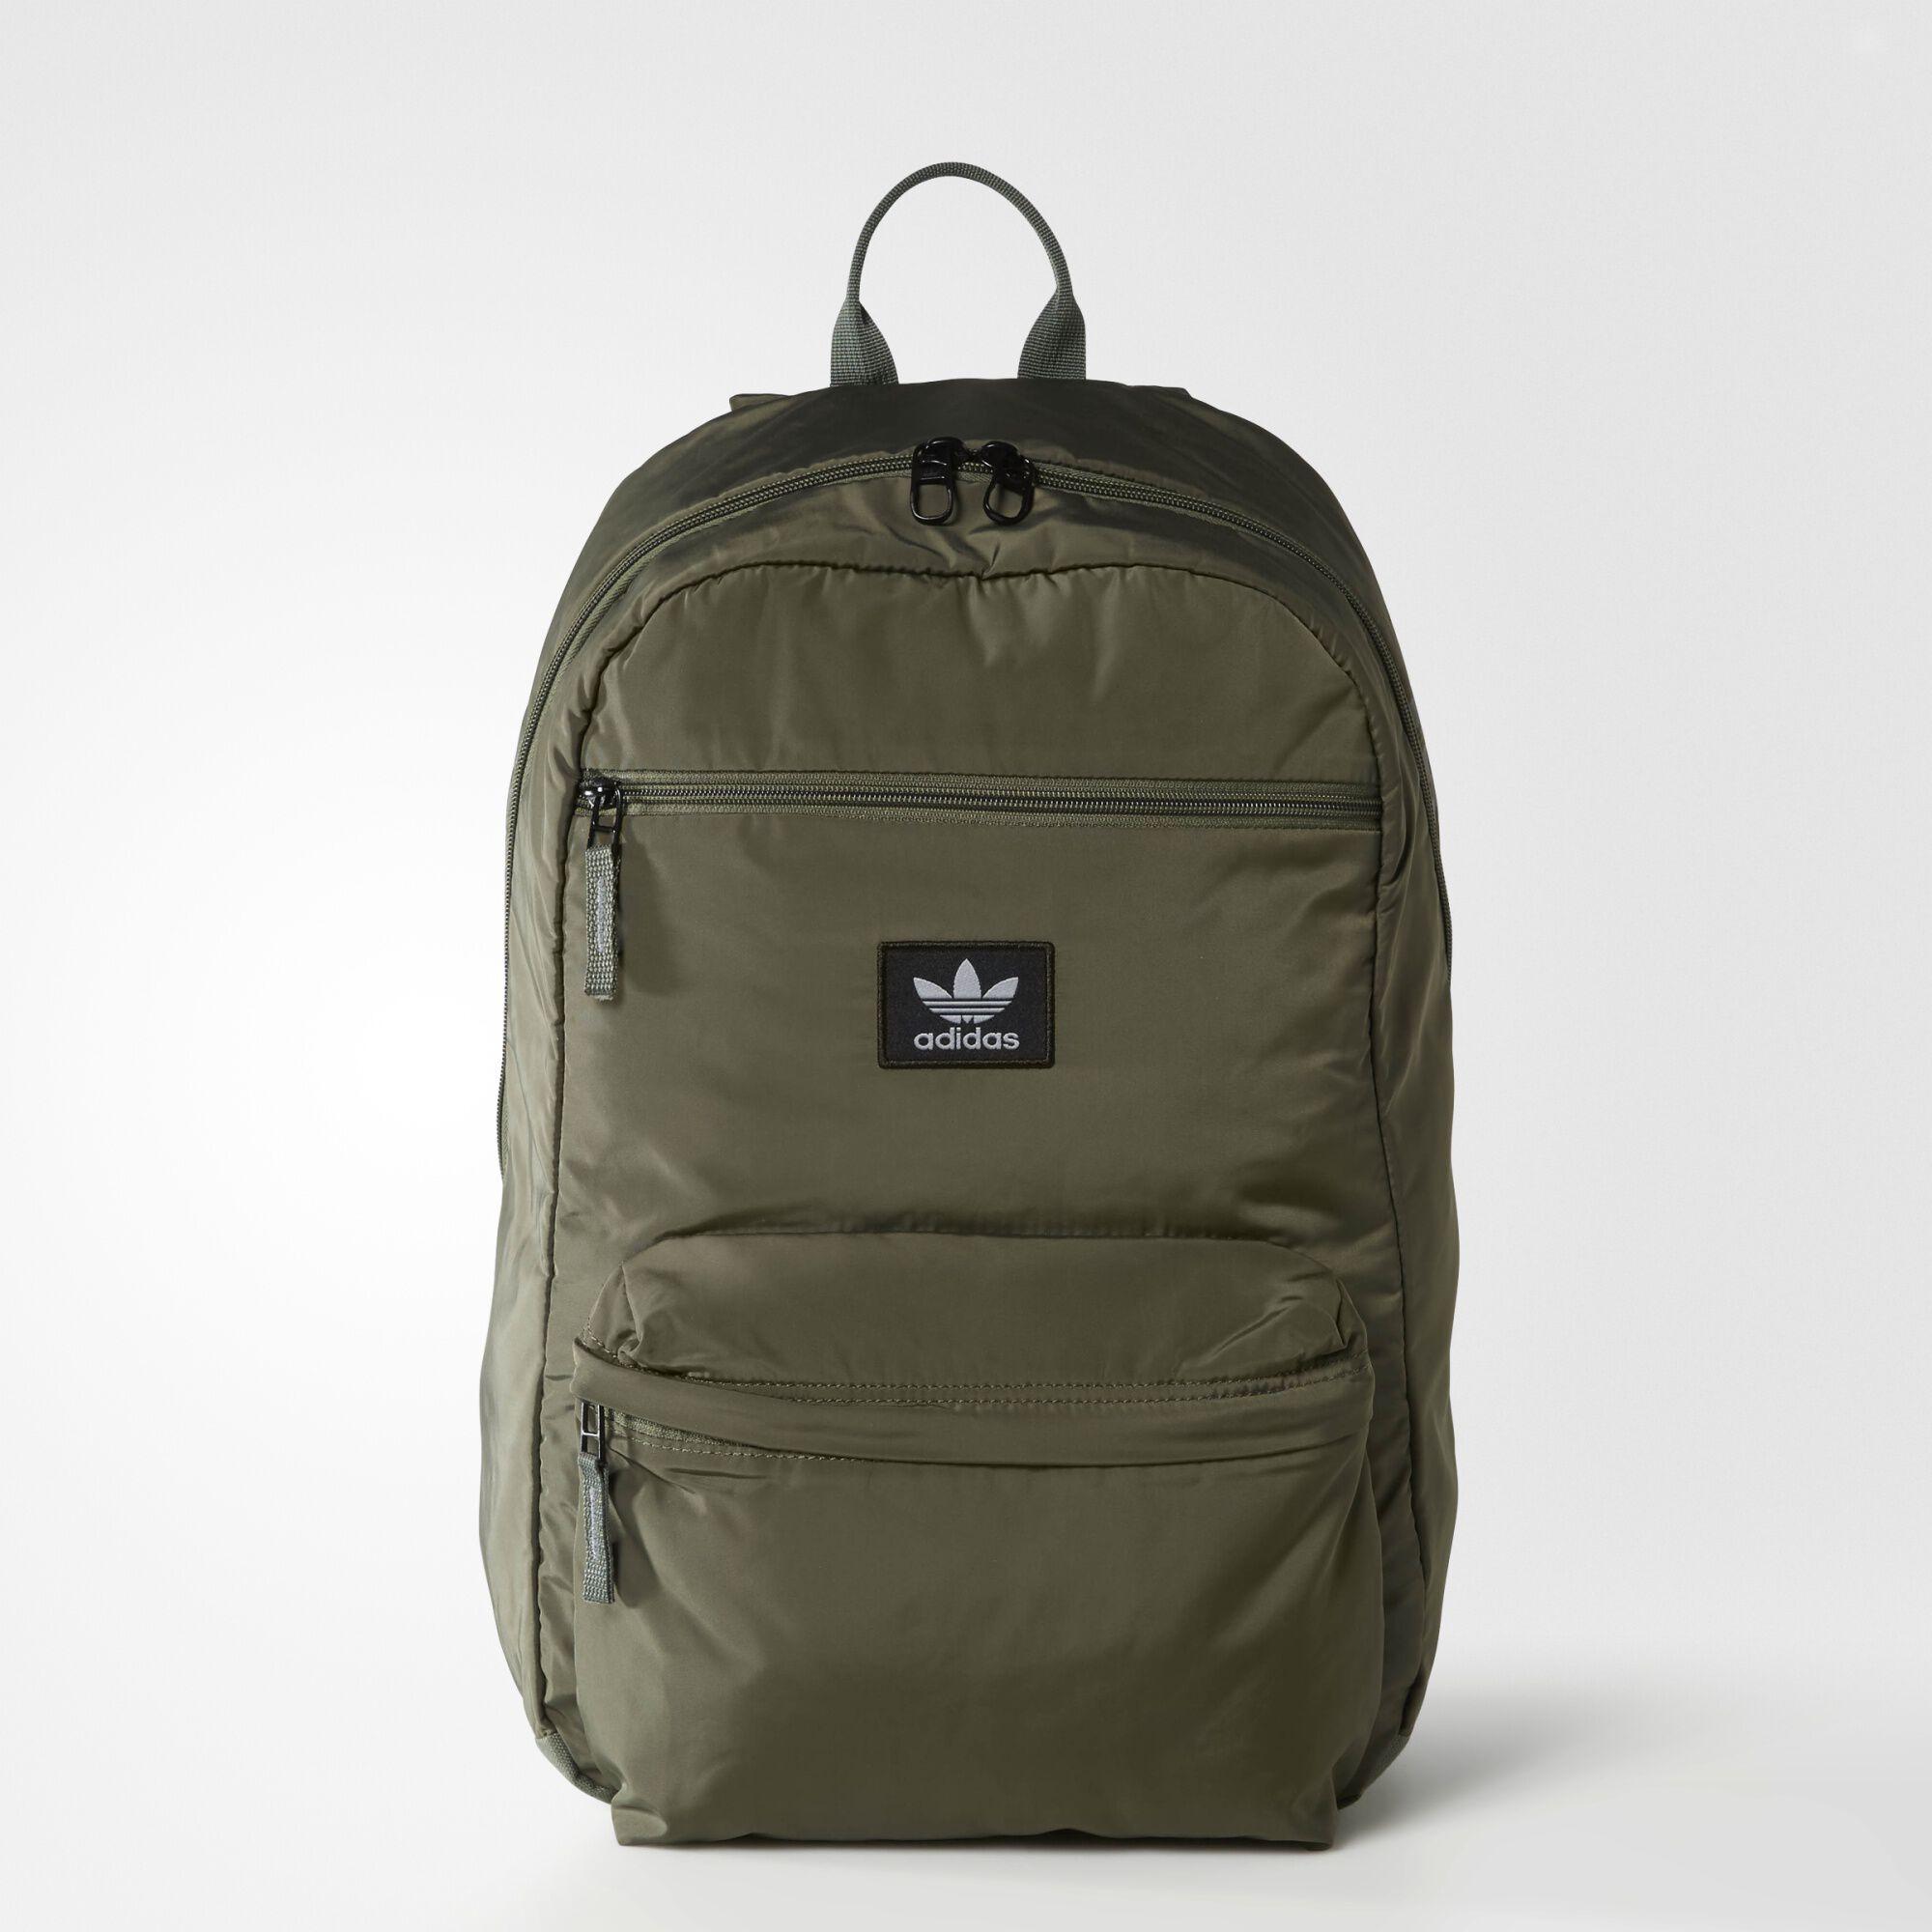 885f71a0749a Buy adidas campus bag   OFF43% Discounted